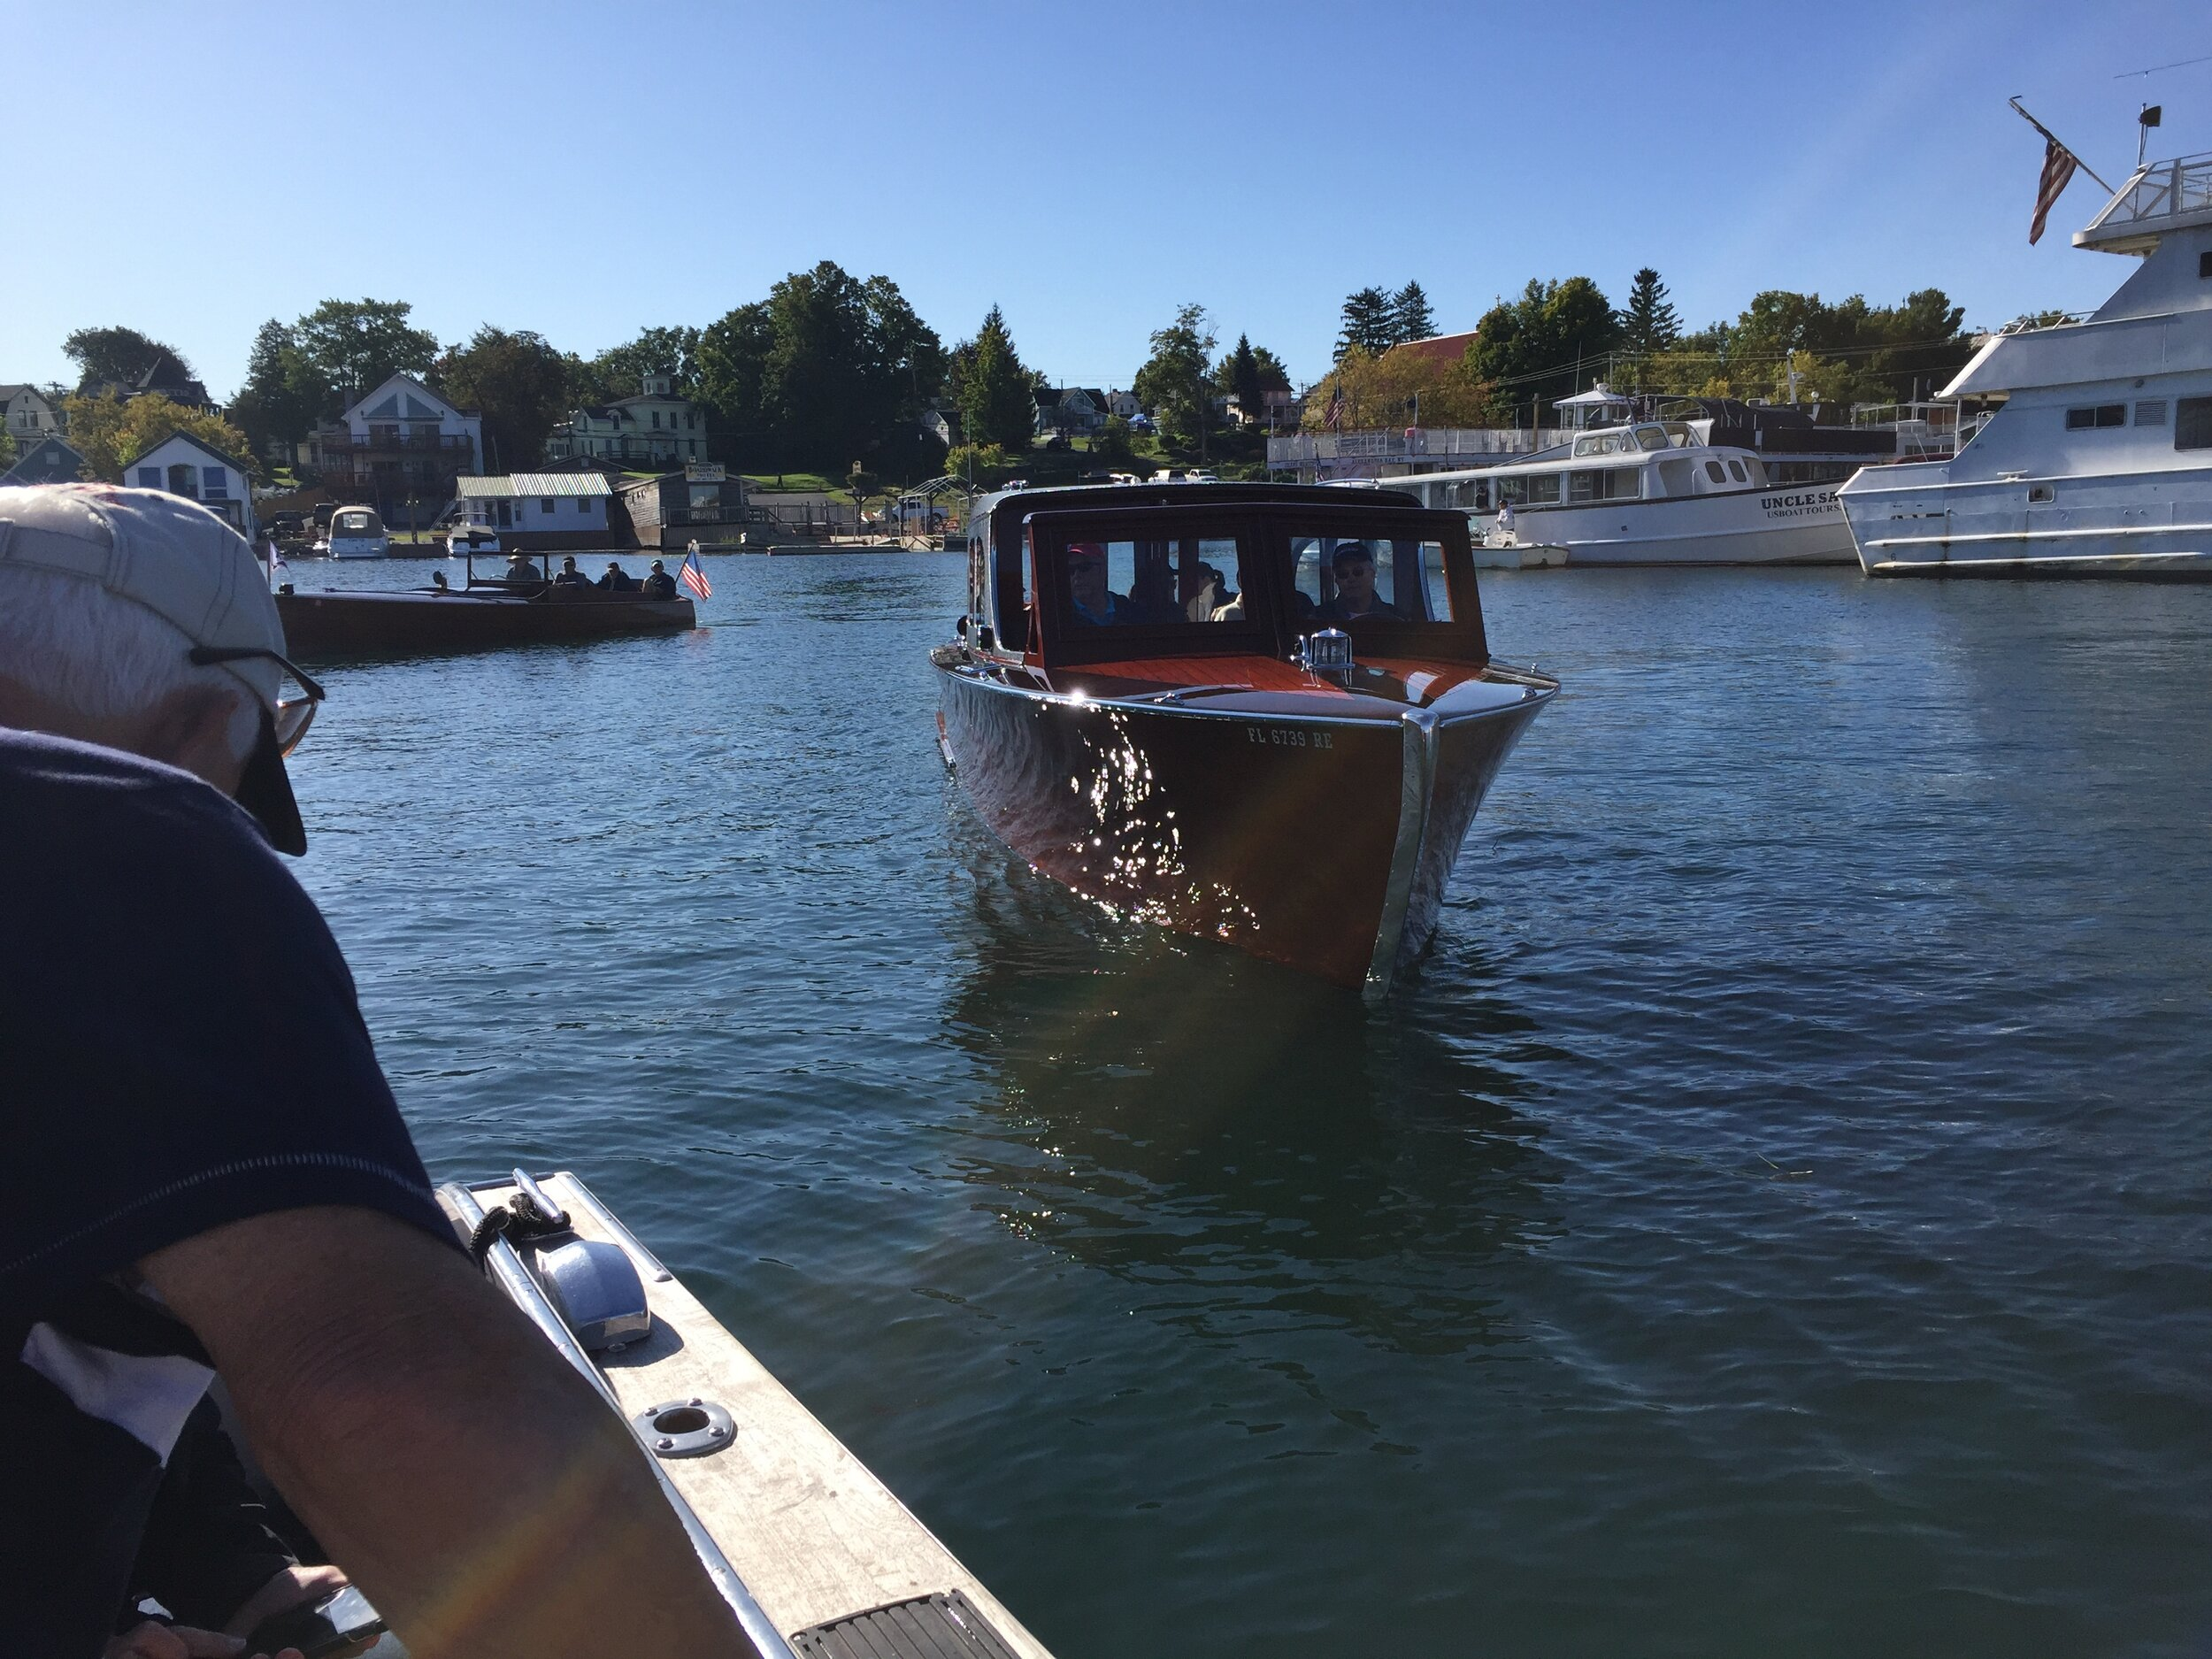 Tuesday's tour of Wellesley Island aboard Matt and Susie's Hubert Johnson Blackjack